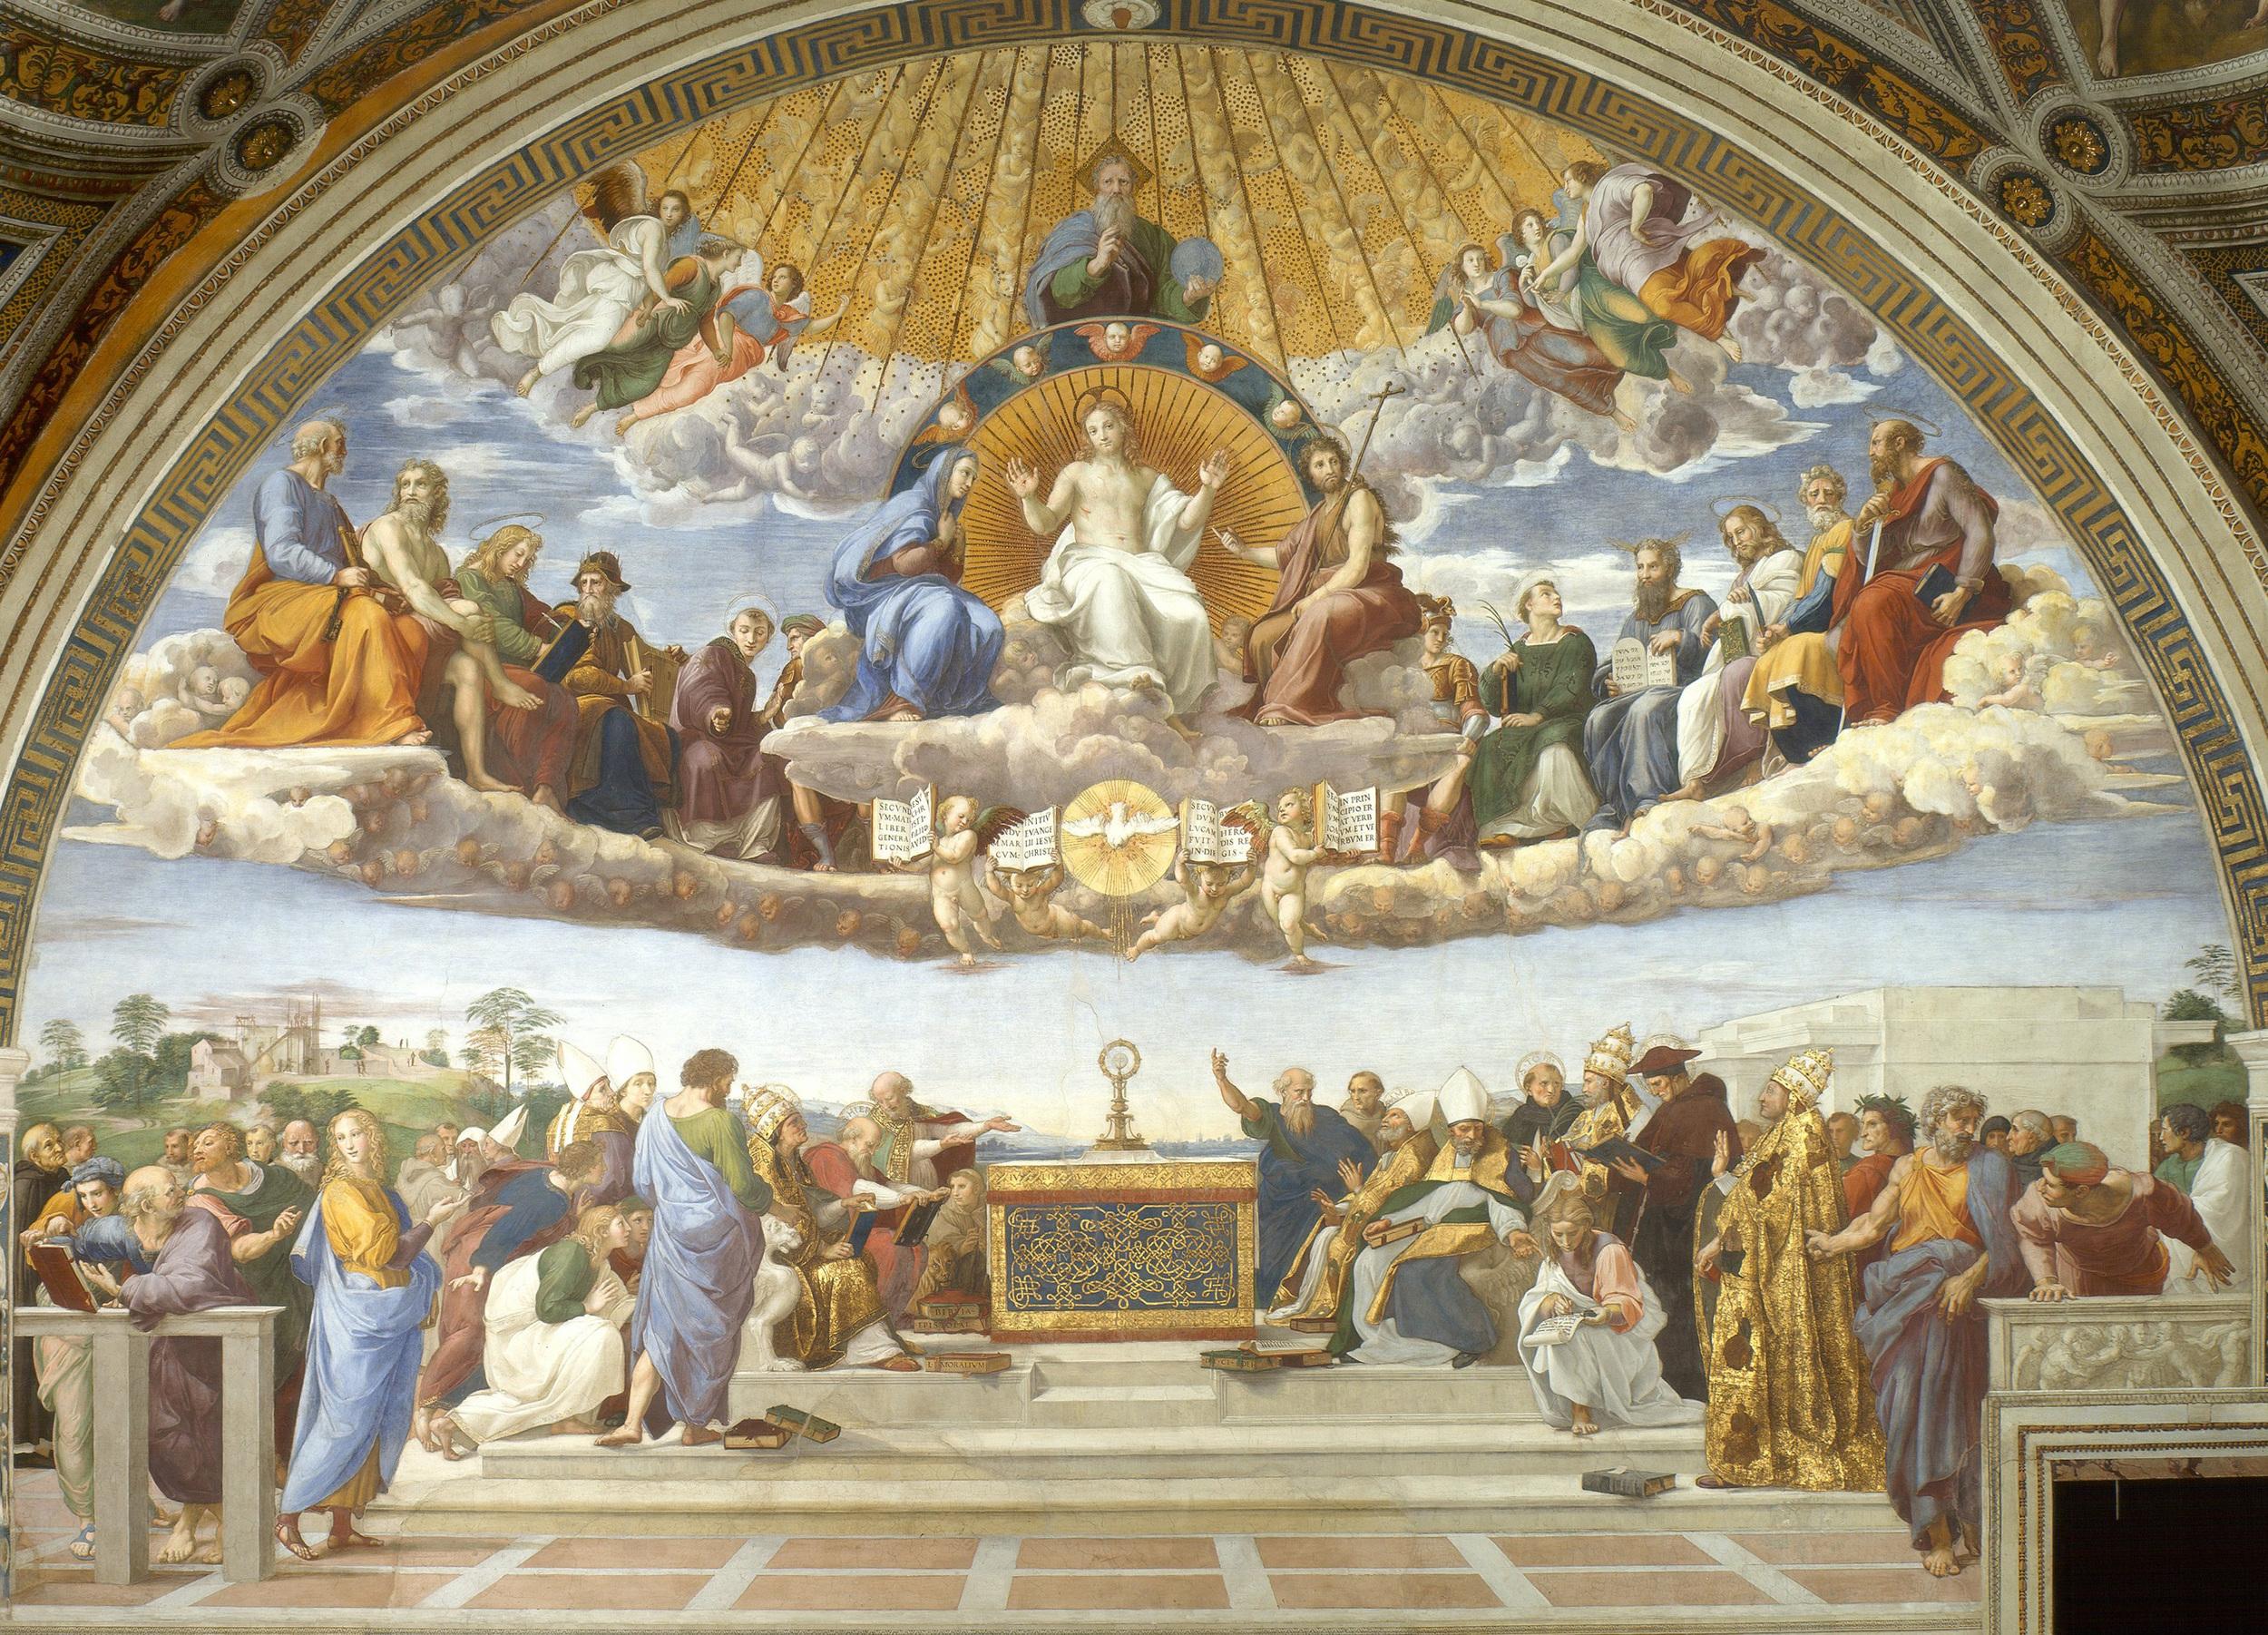 The Disputation of the Sacrament, or Disputa